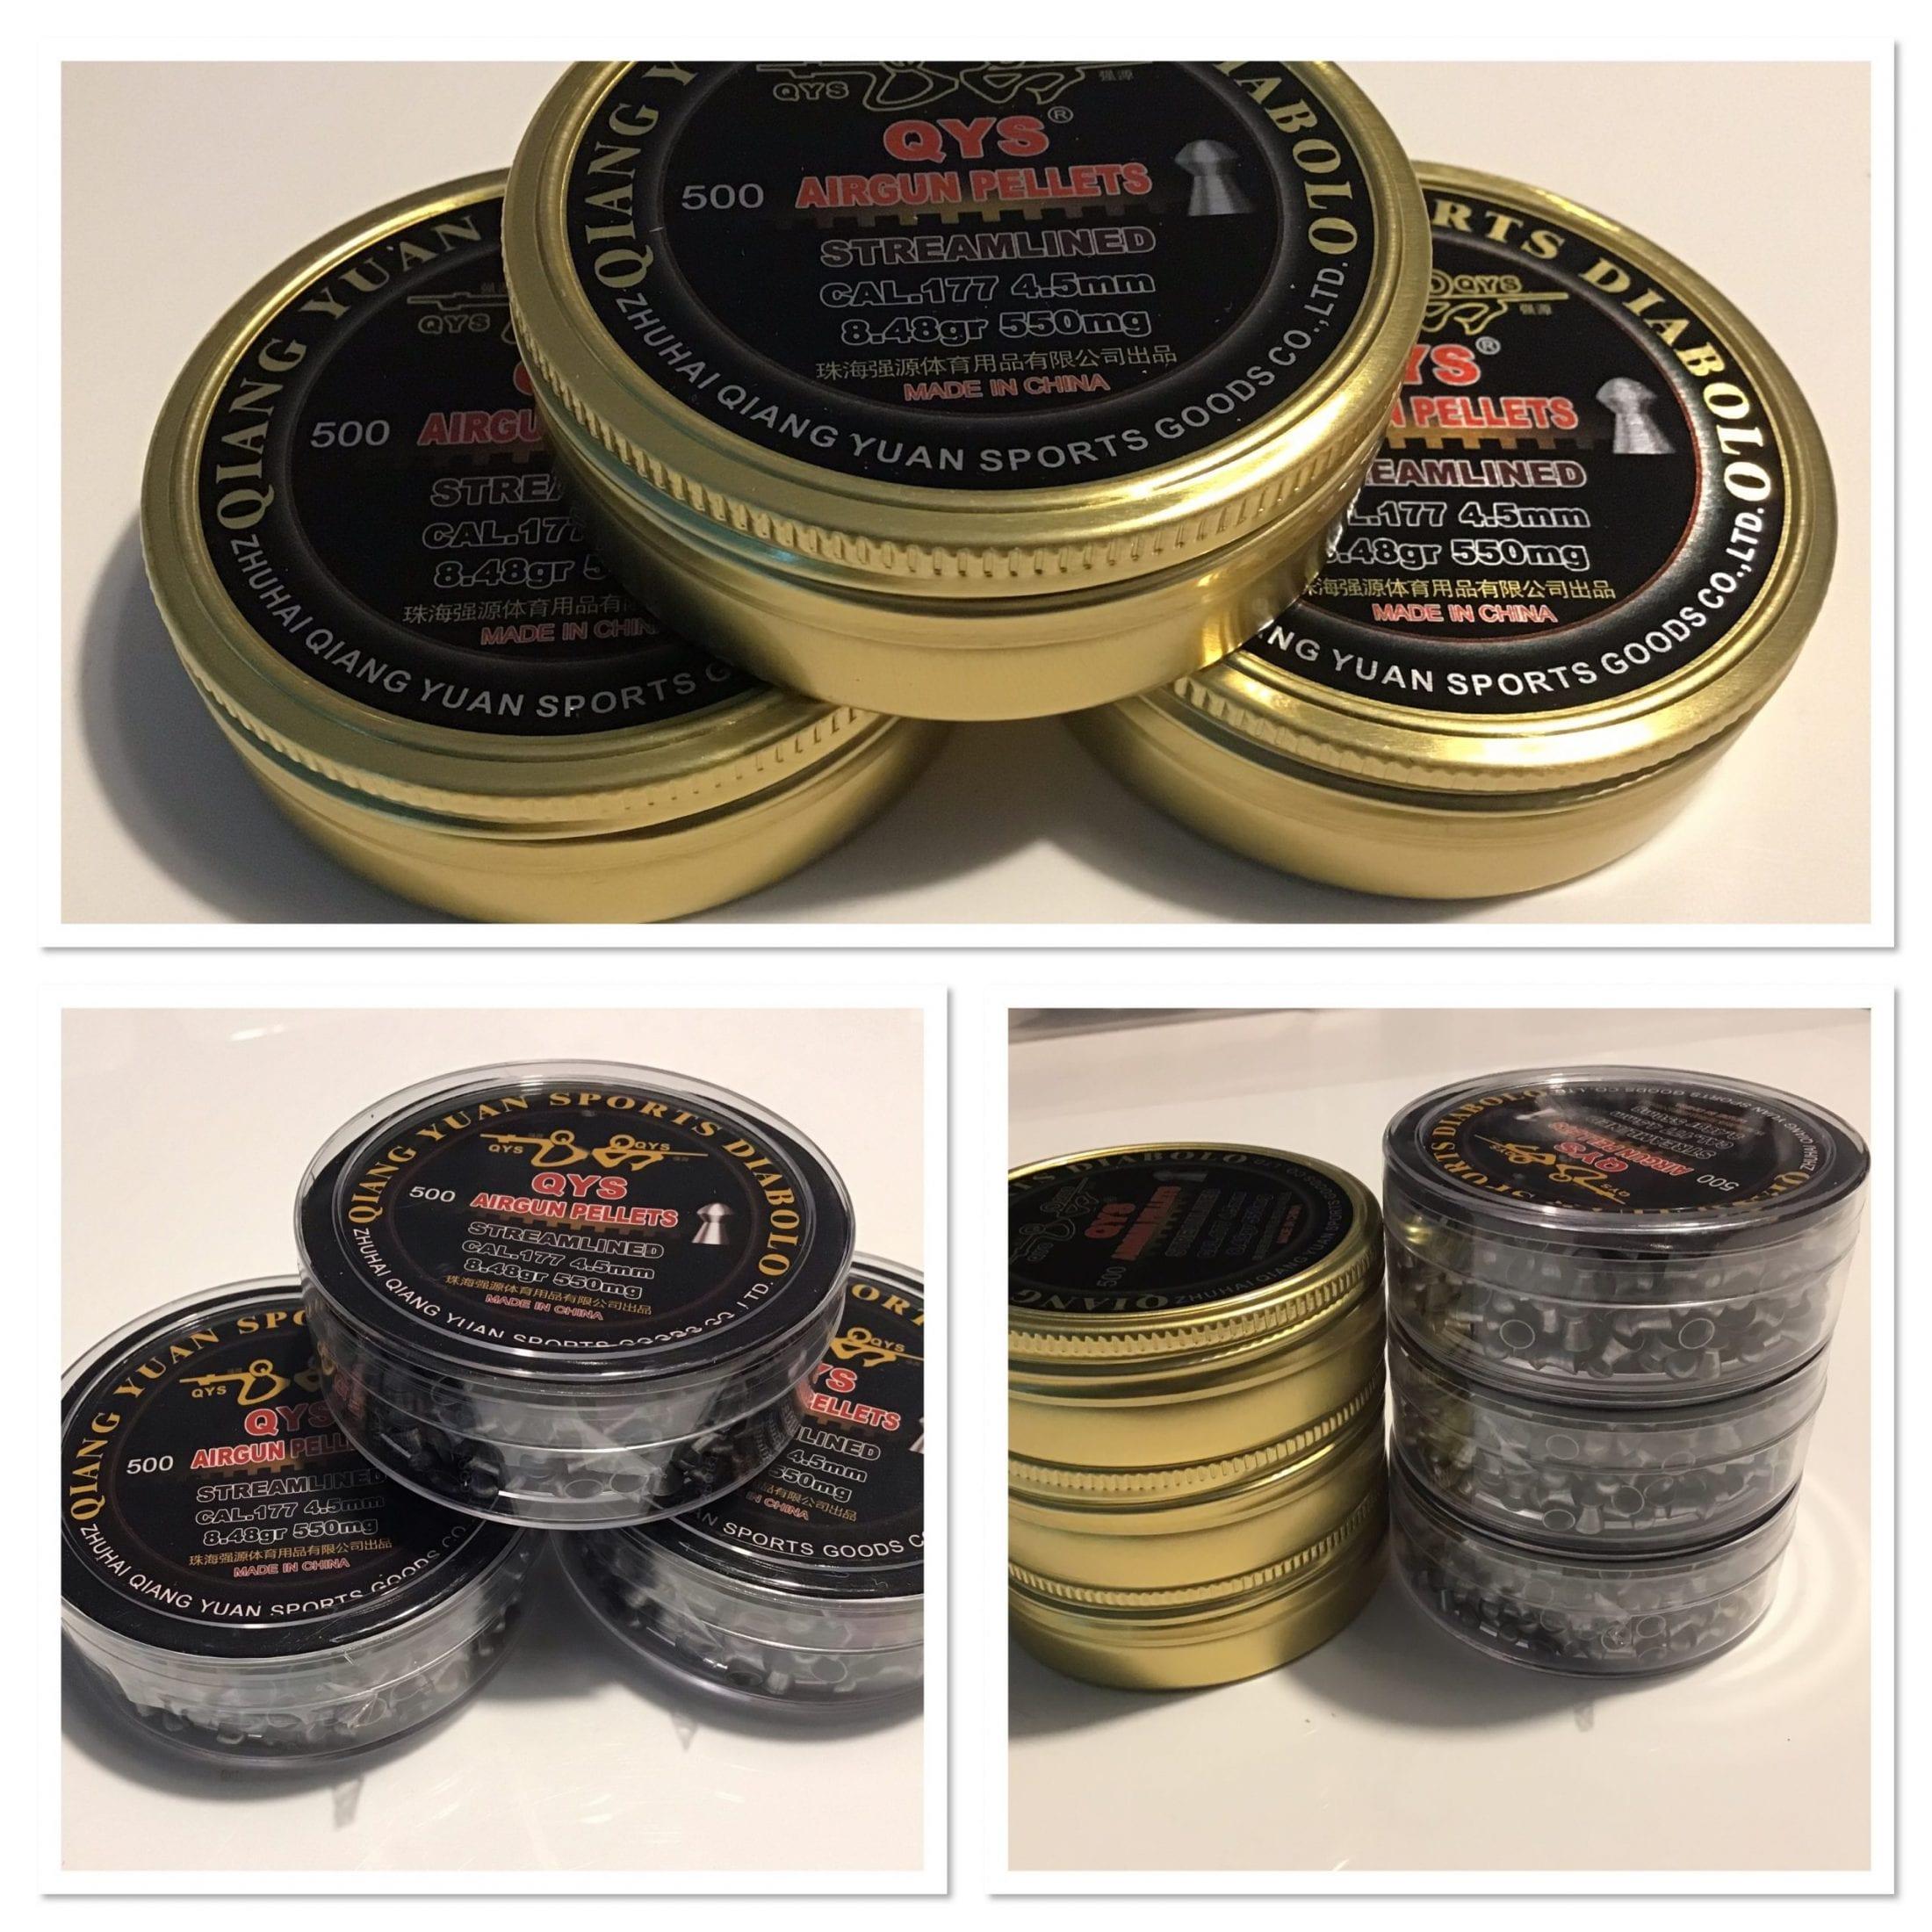 QYS in tins